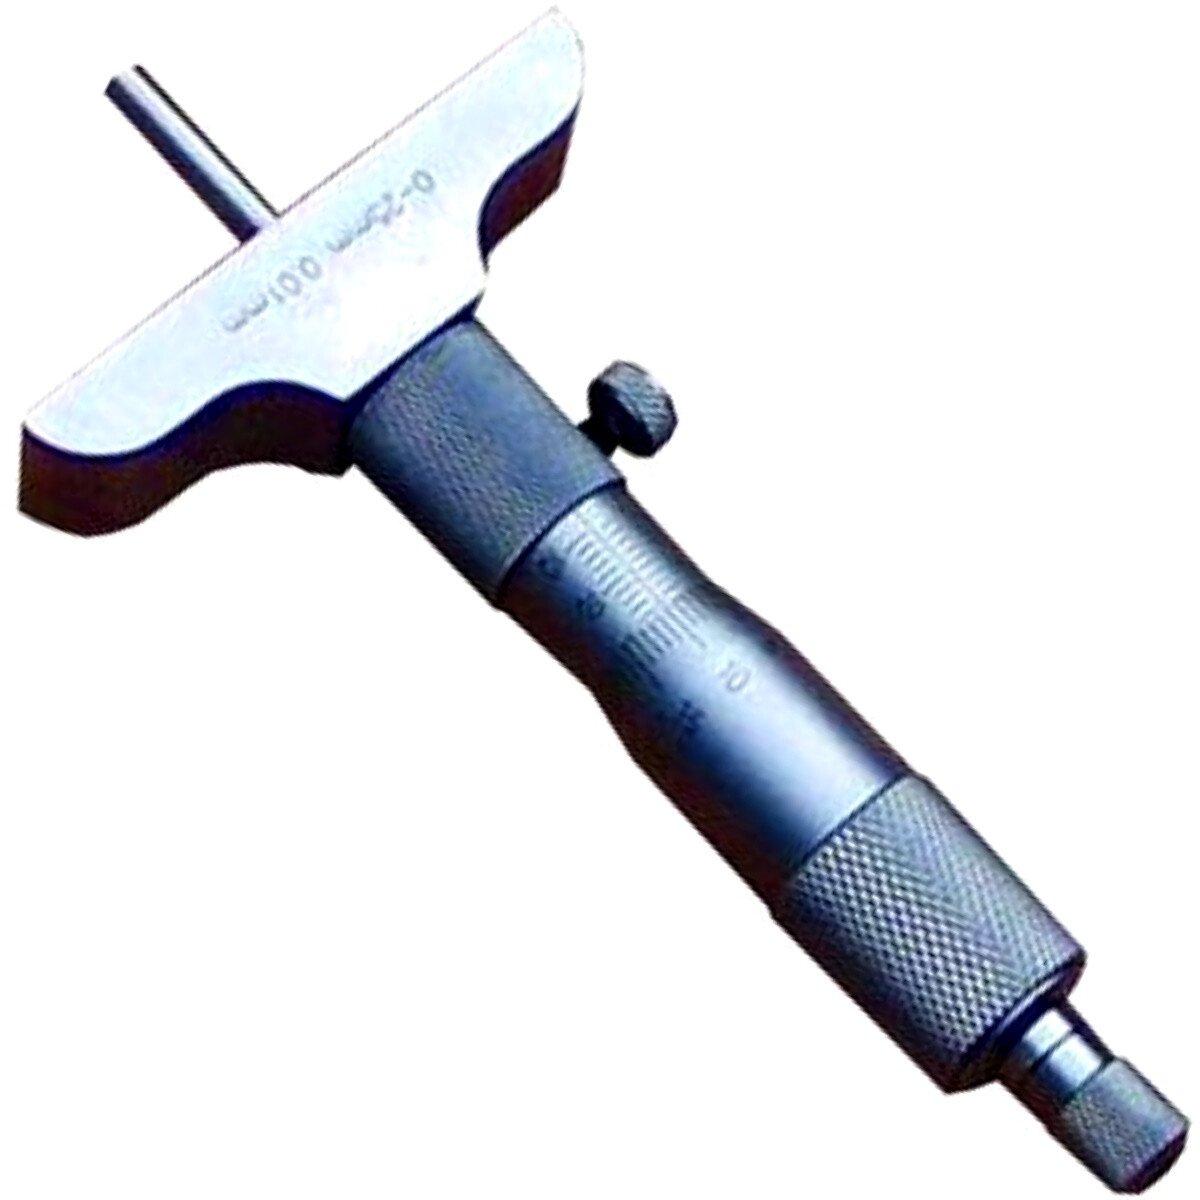 Linear Tools 50-175-006 Depth Micrometer DIN 863 – 0-6″